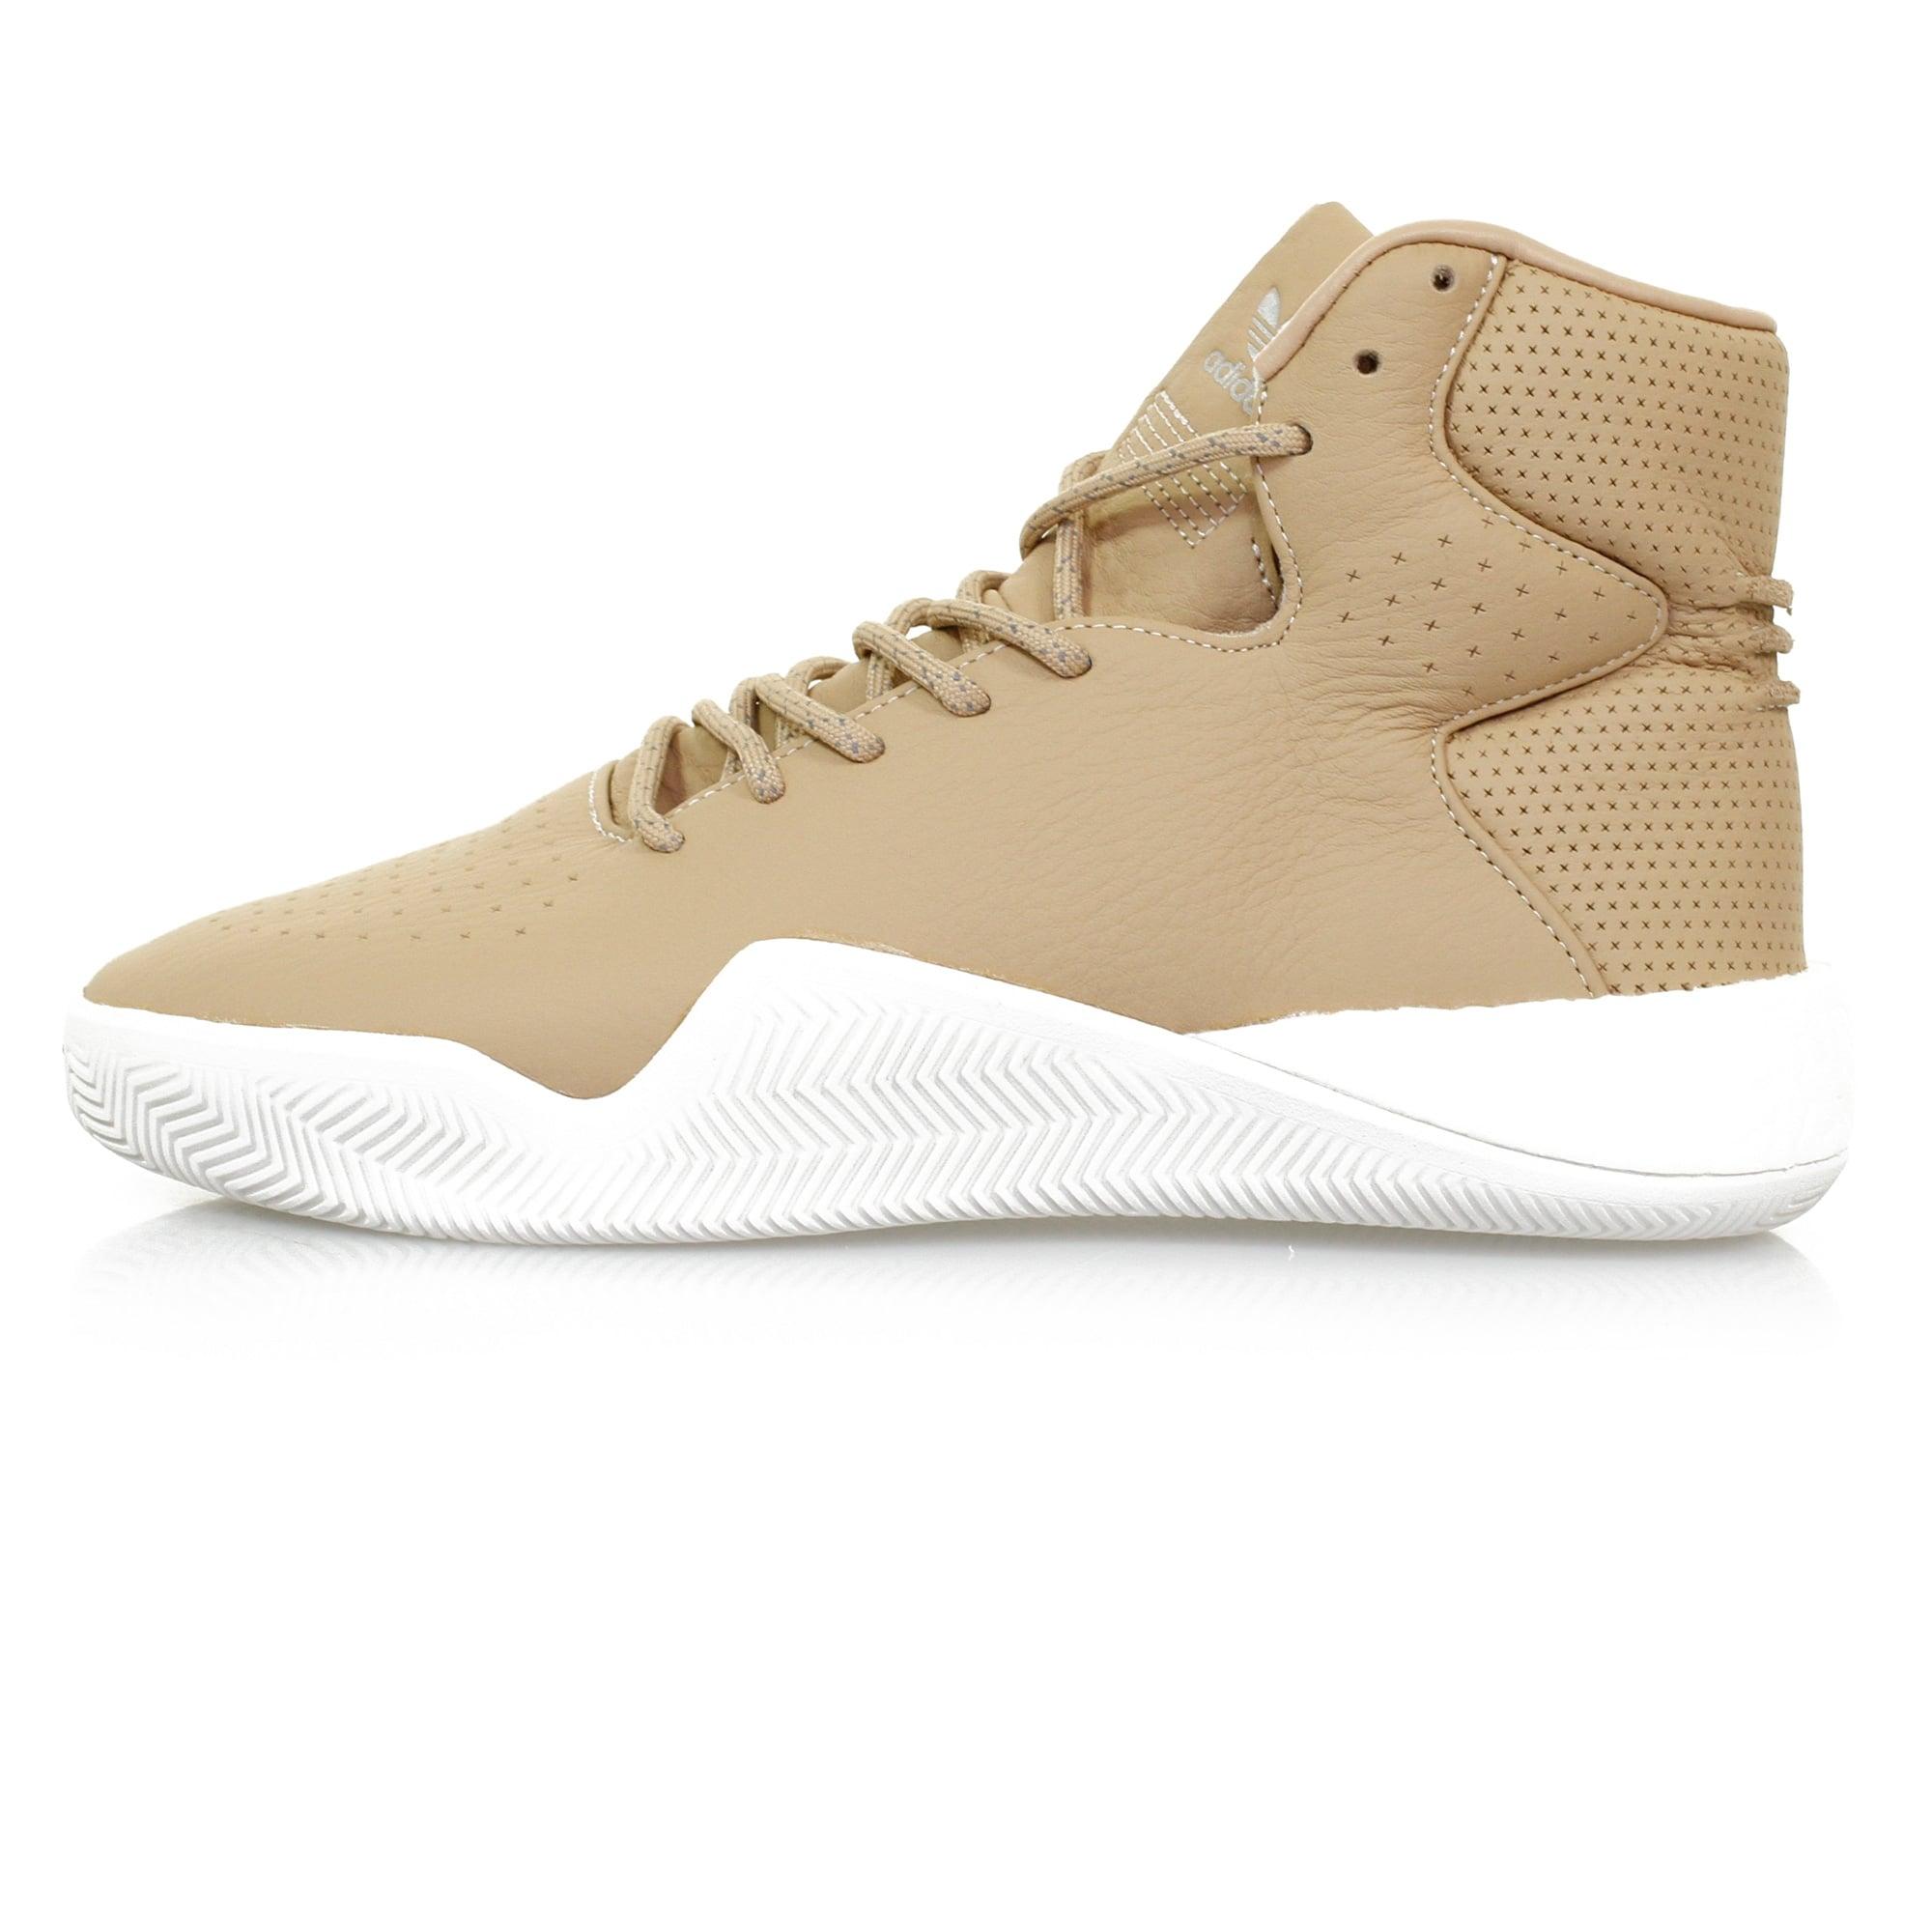 more photos cb7f4 61ba7 Adidas Tubular Instinct Boost Chalk White Beige Shoe BB8400